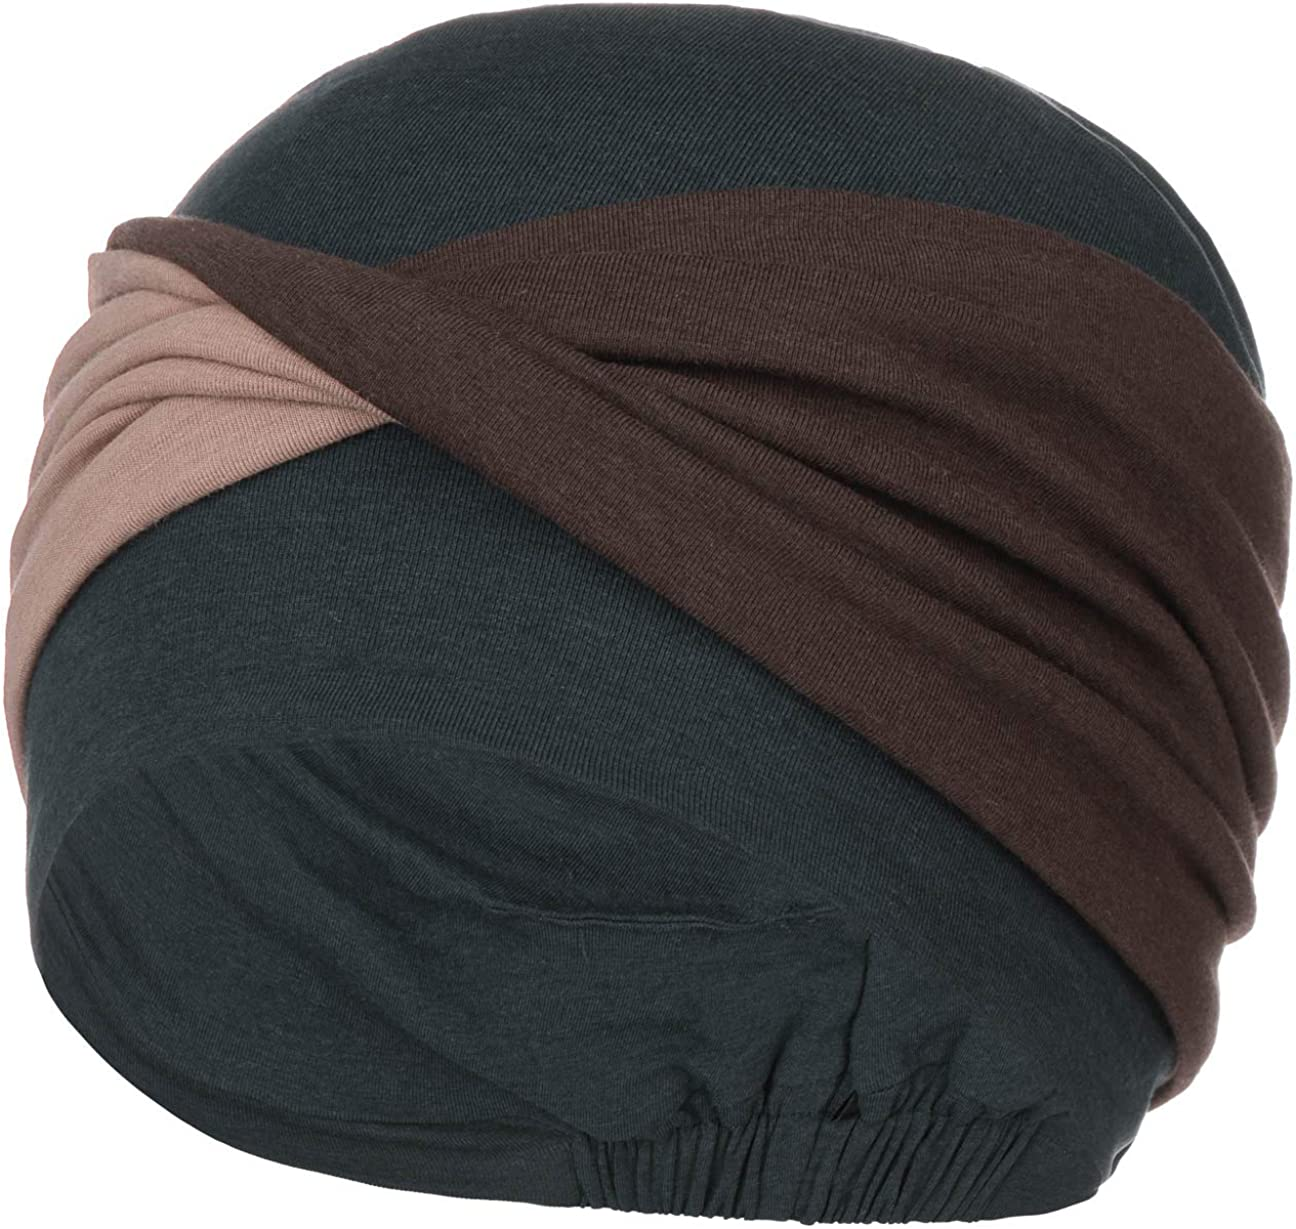 Christine Headwear Zoyana Colour Mix Turban Damenturban Stoffturban Baumwollturban